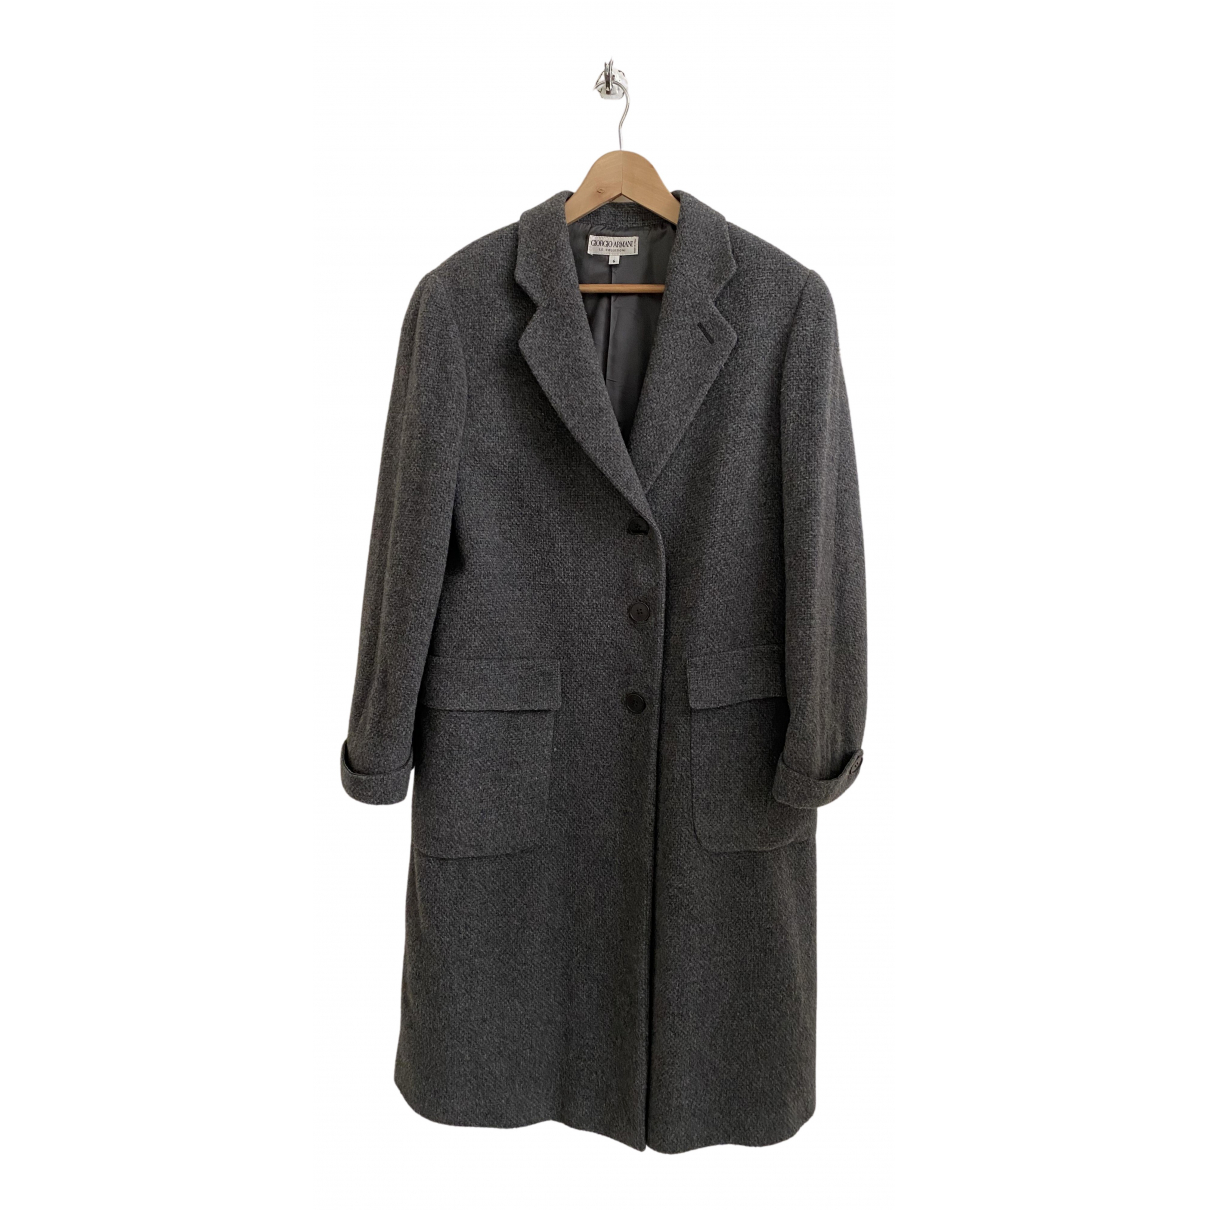 Giorgio Armani - Manteau   pour femme en laine - anthracite